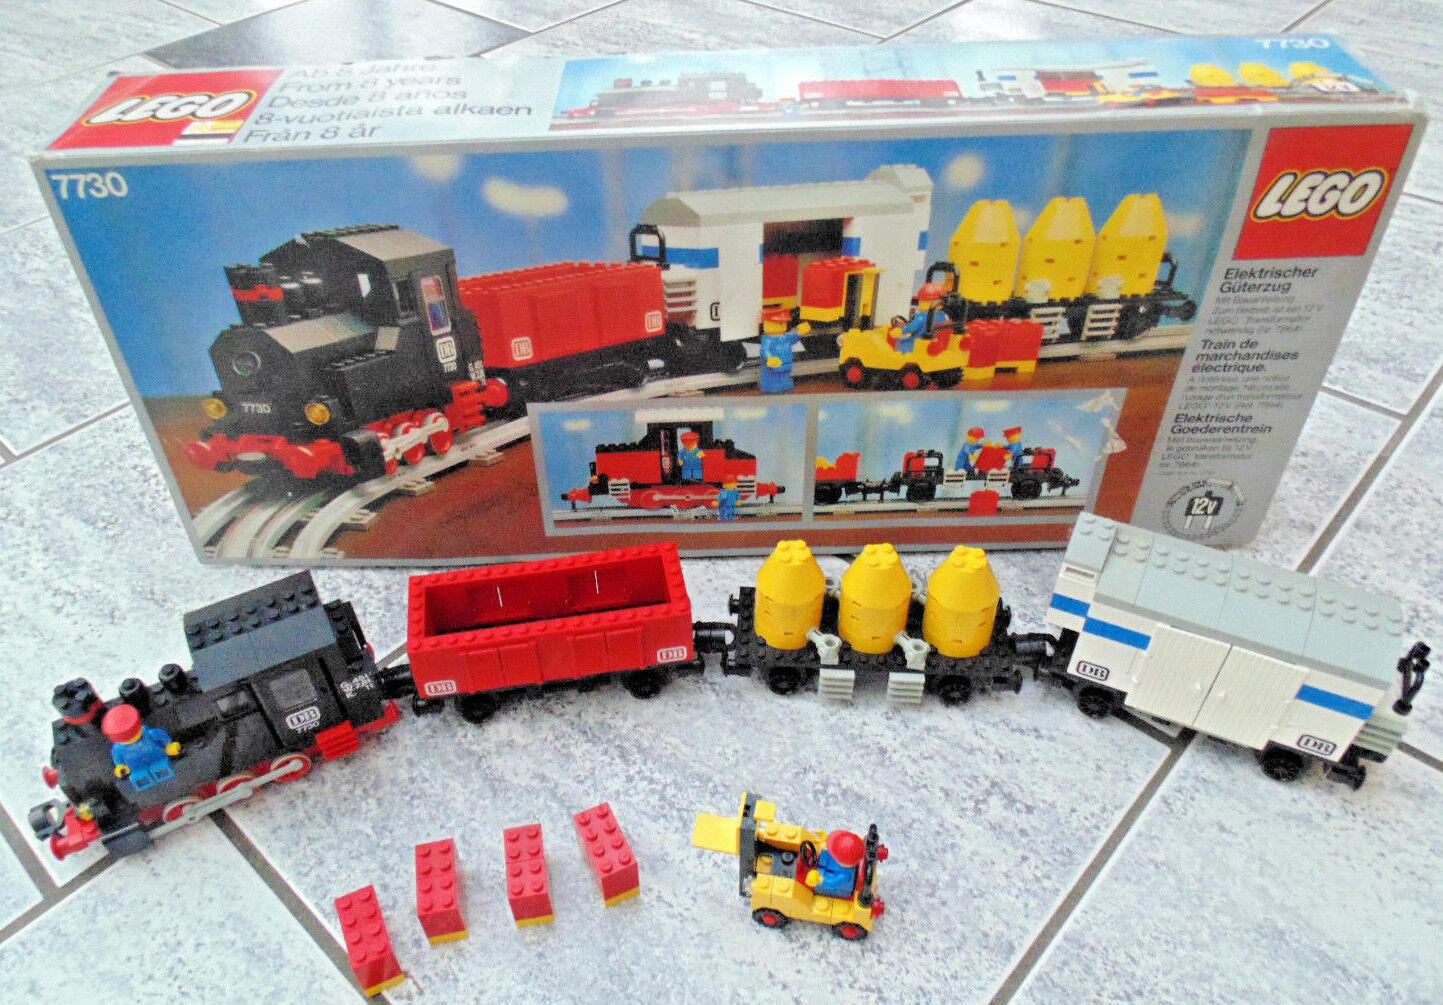 LEGO Ferrovia 12v 12 Volt, locomotiva, Lok, treno merci  7730  con BA + OVP